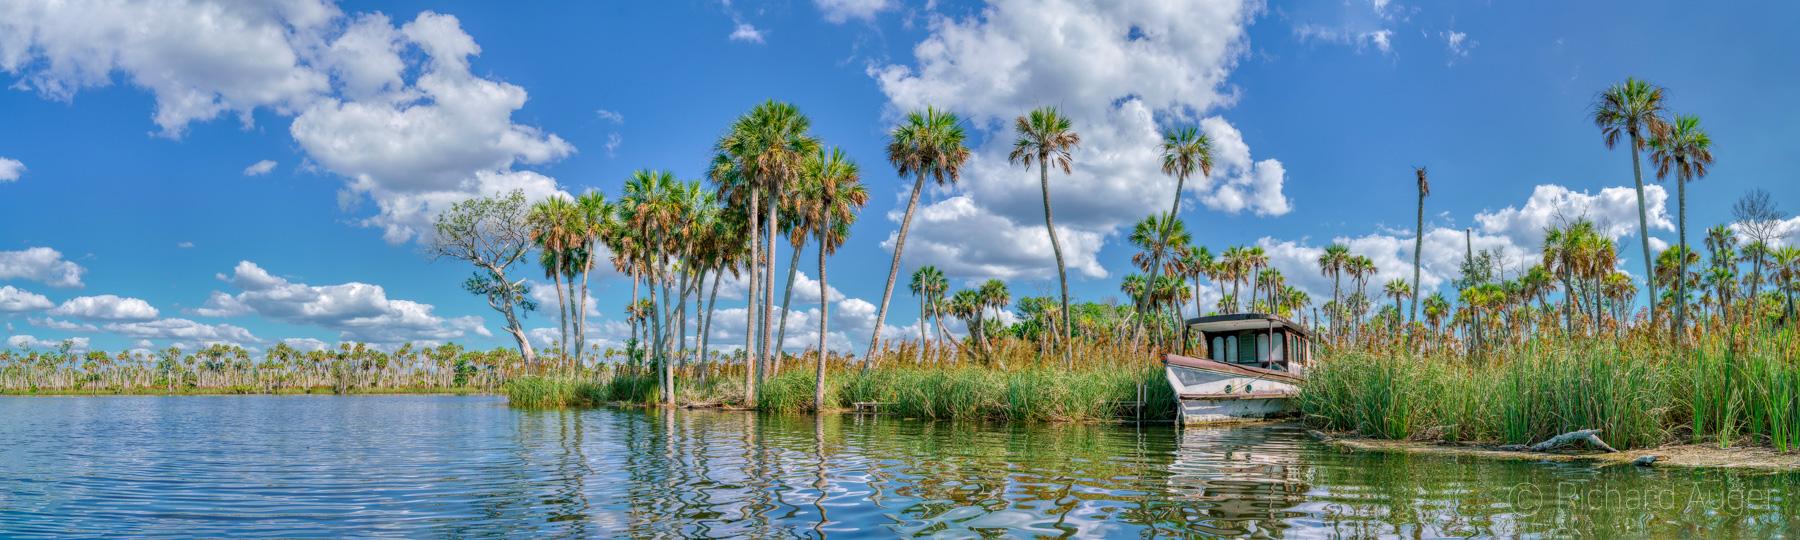 Chassahowitzka River, Bay, Florida, Boat, Palm Trees, Landscape, Photograph, Swamp